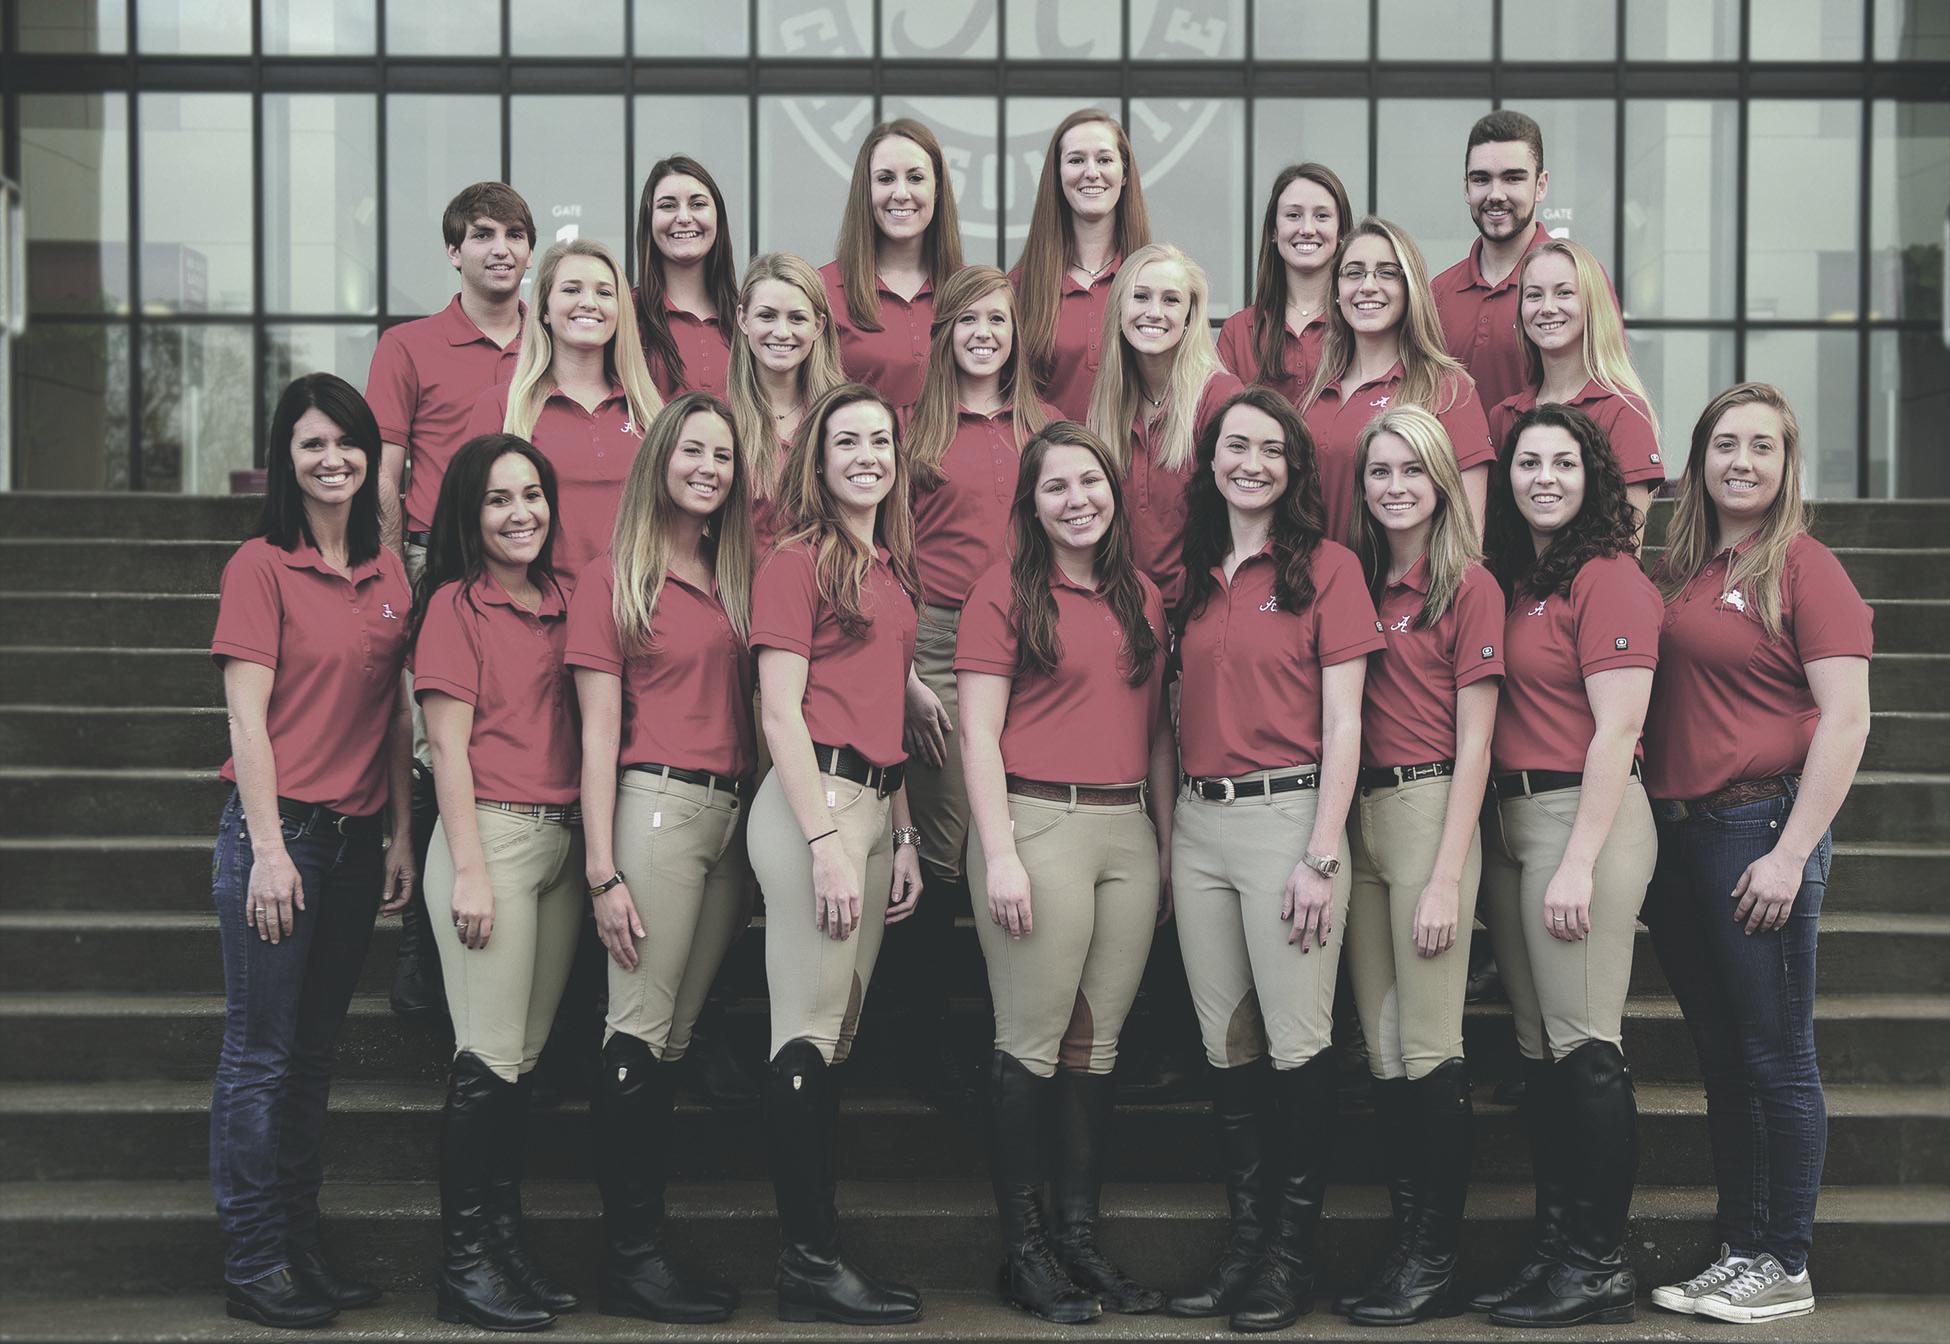 The University Of Alabama Equestrian Team The Web Initiative